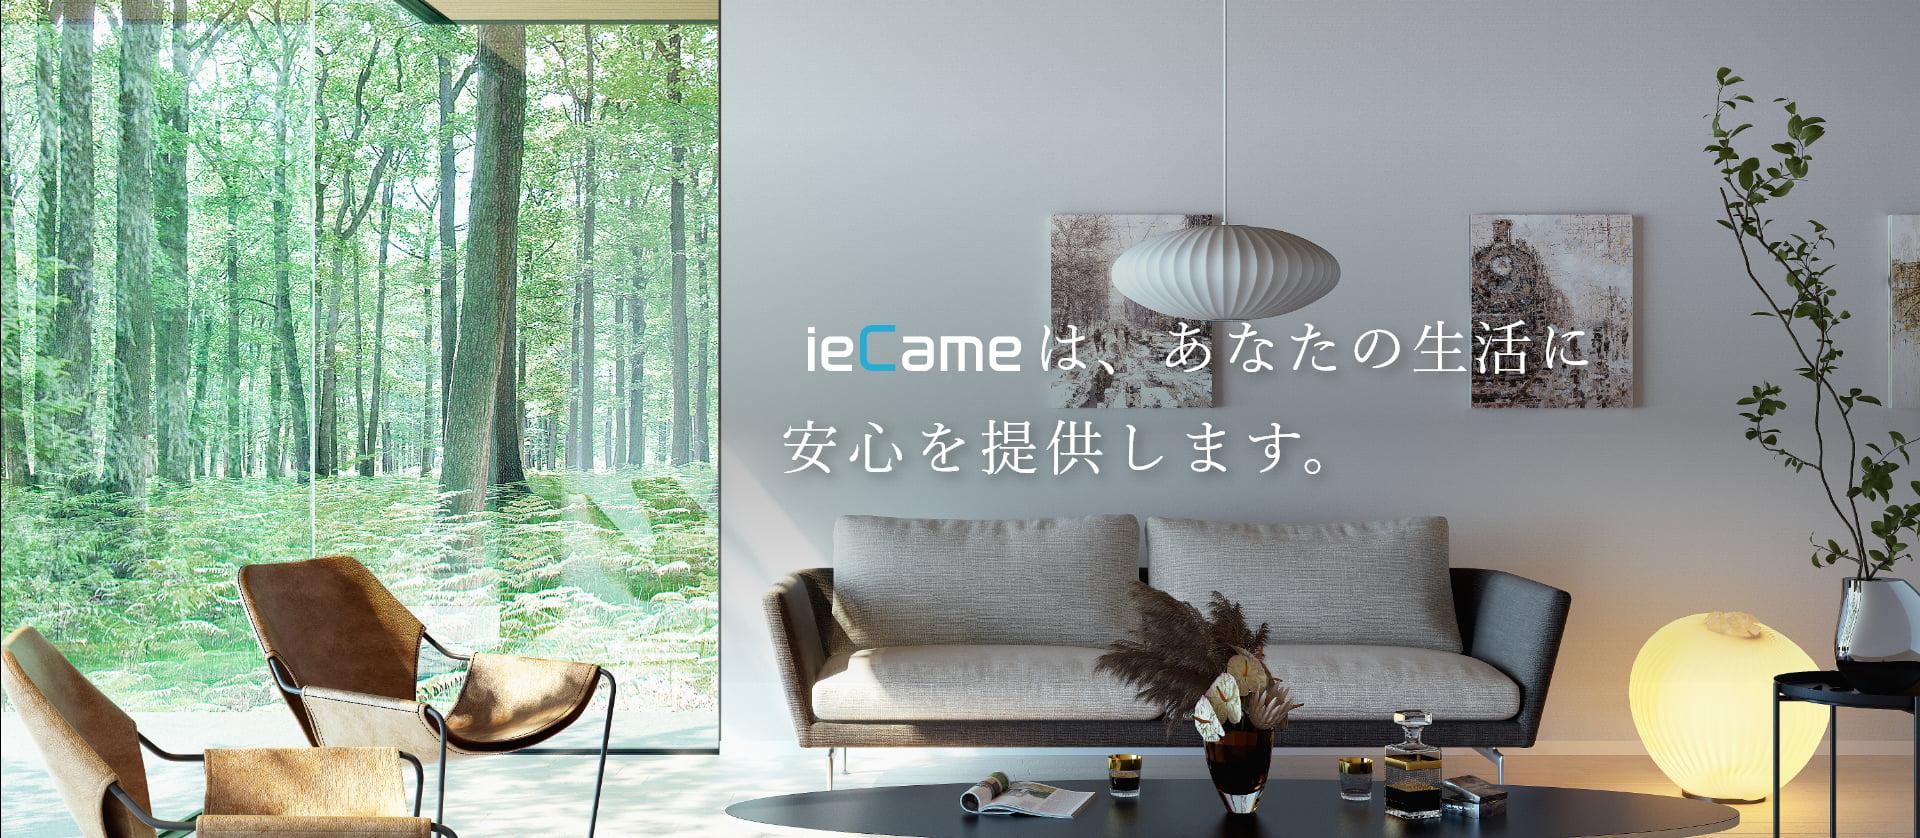 ieCameは、あなたの生活に安心と安らぎを提供します。